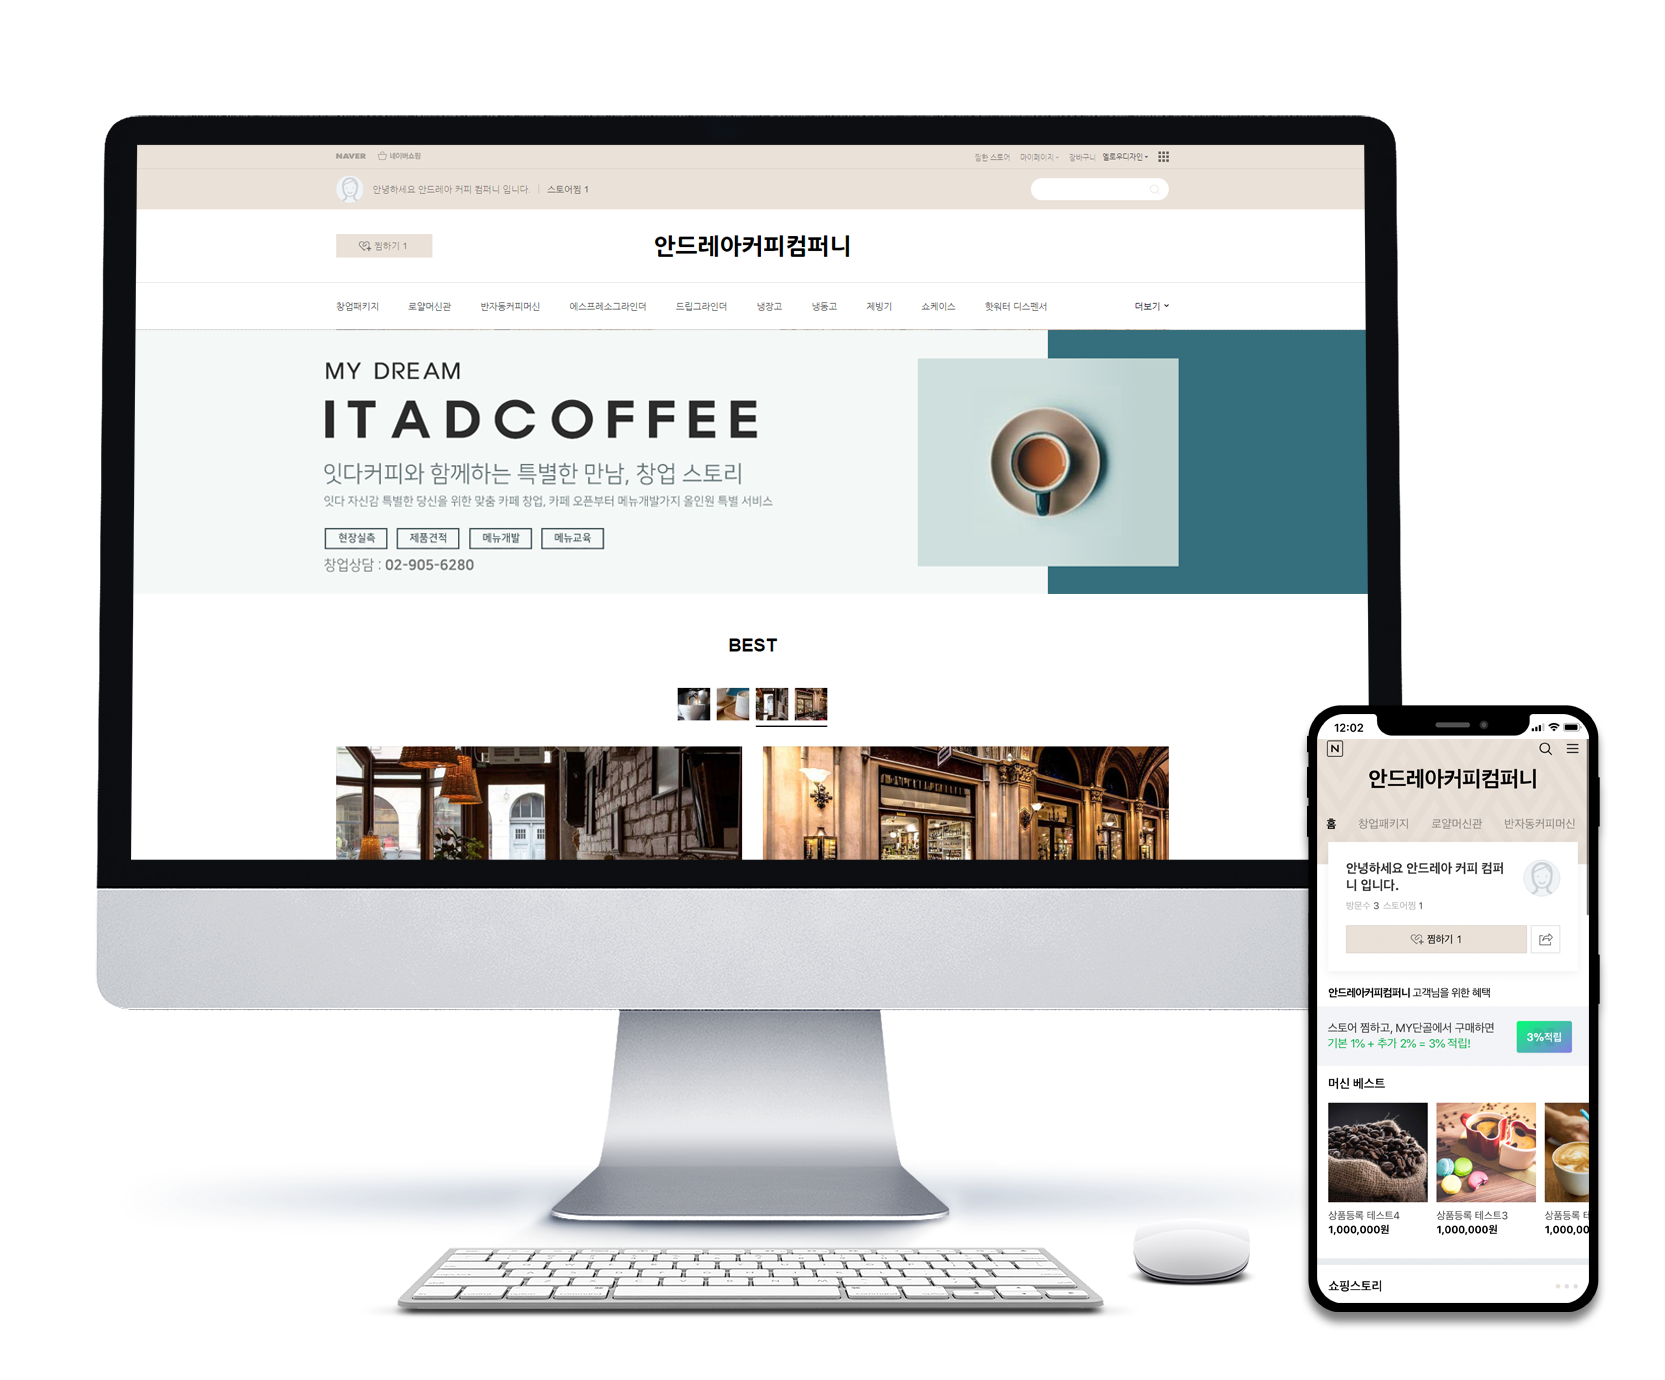 ITDA COFFEE